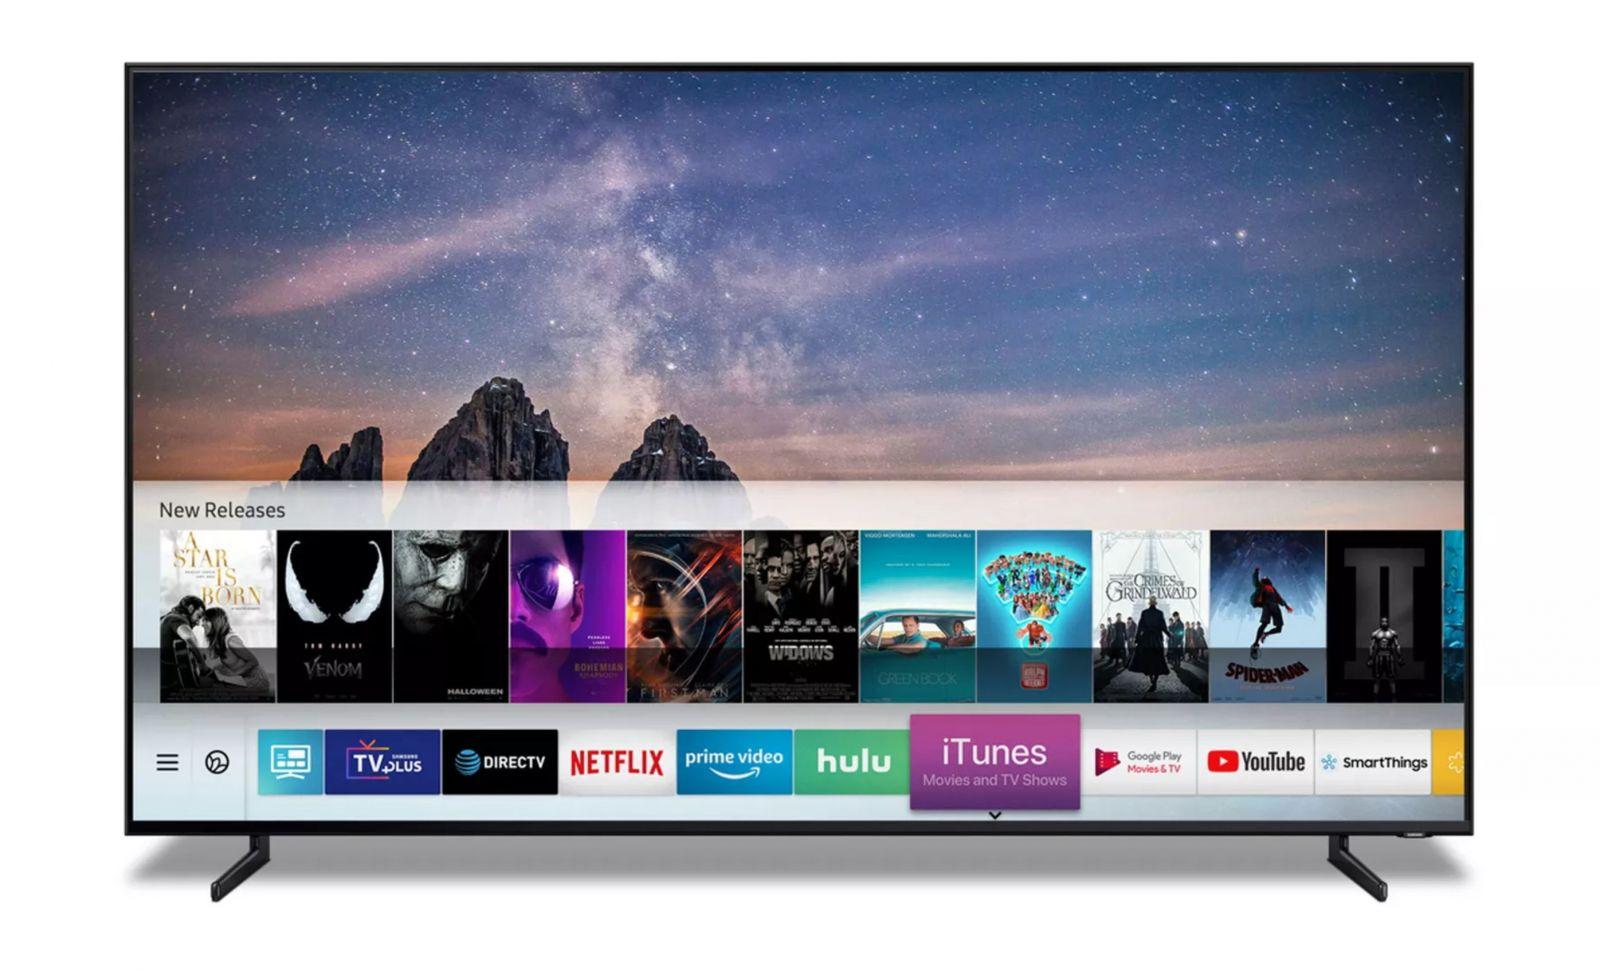 Samsung uzavřel kontrakt s Apple. Nové televize budou mít iTunes i Air Play